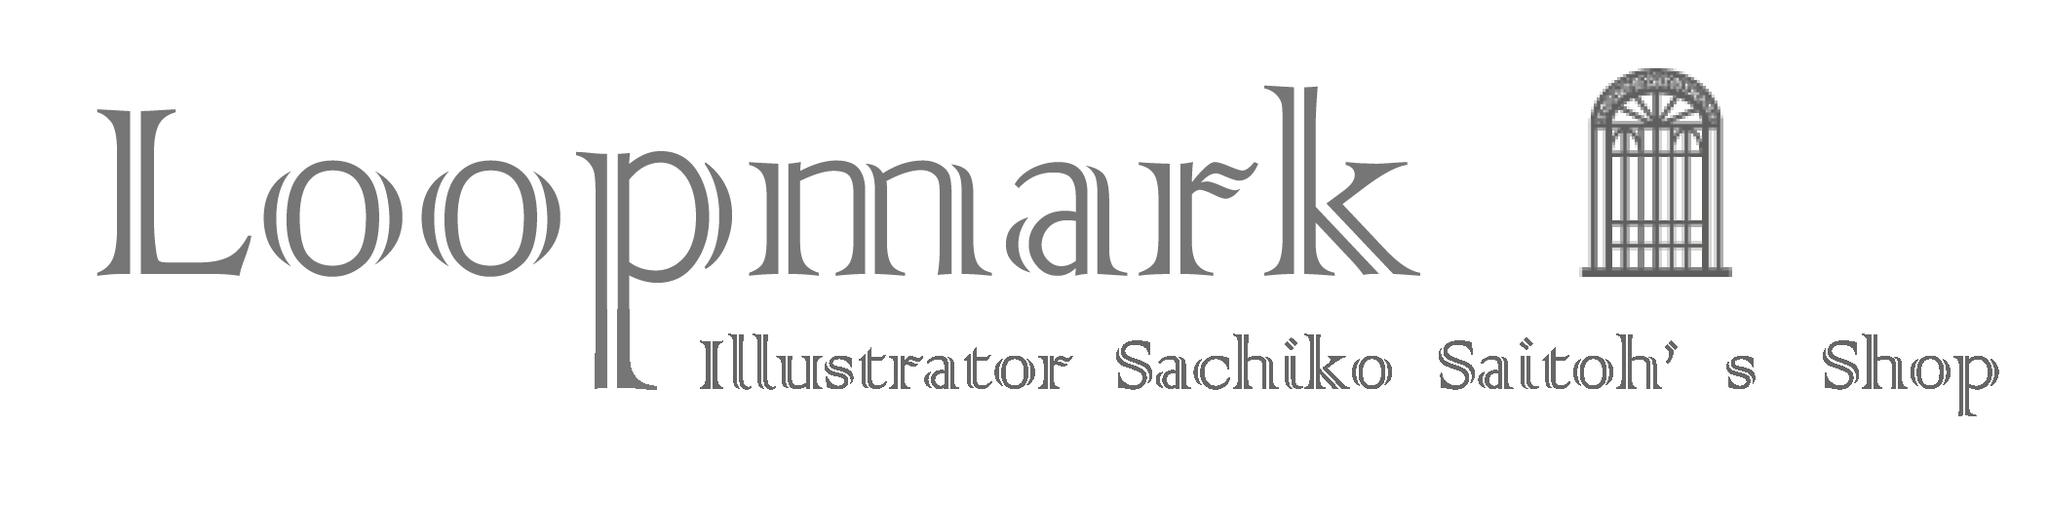 Loopmark  Illustrator 's shop